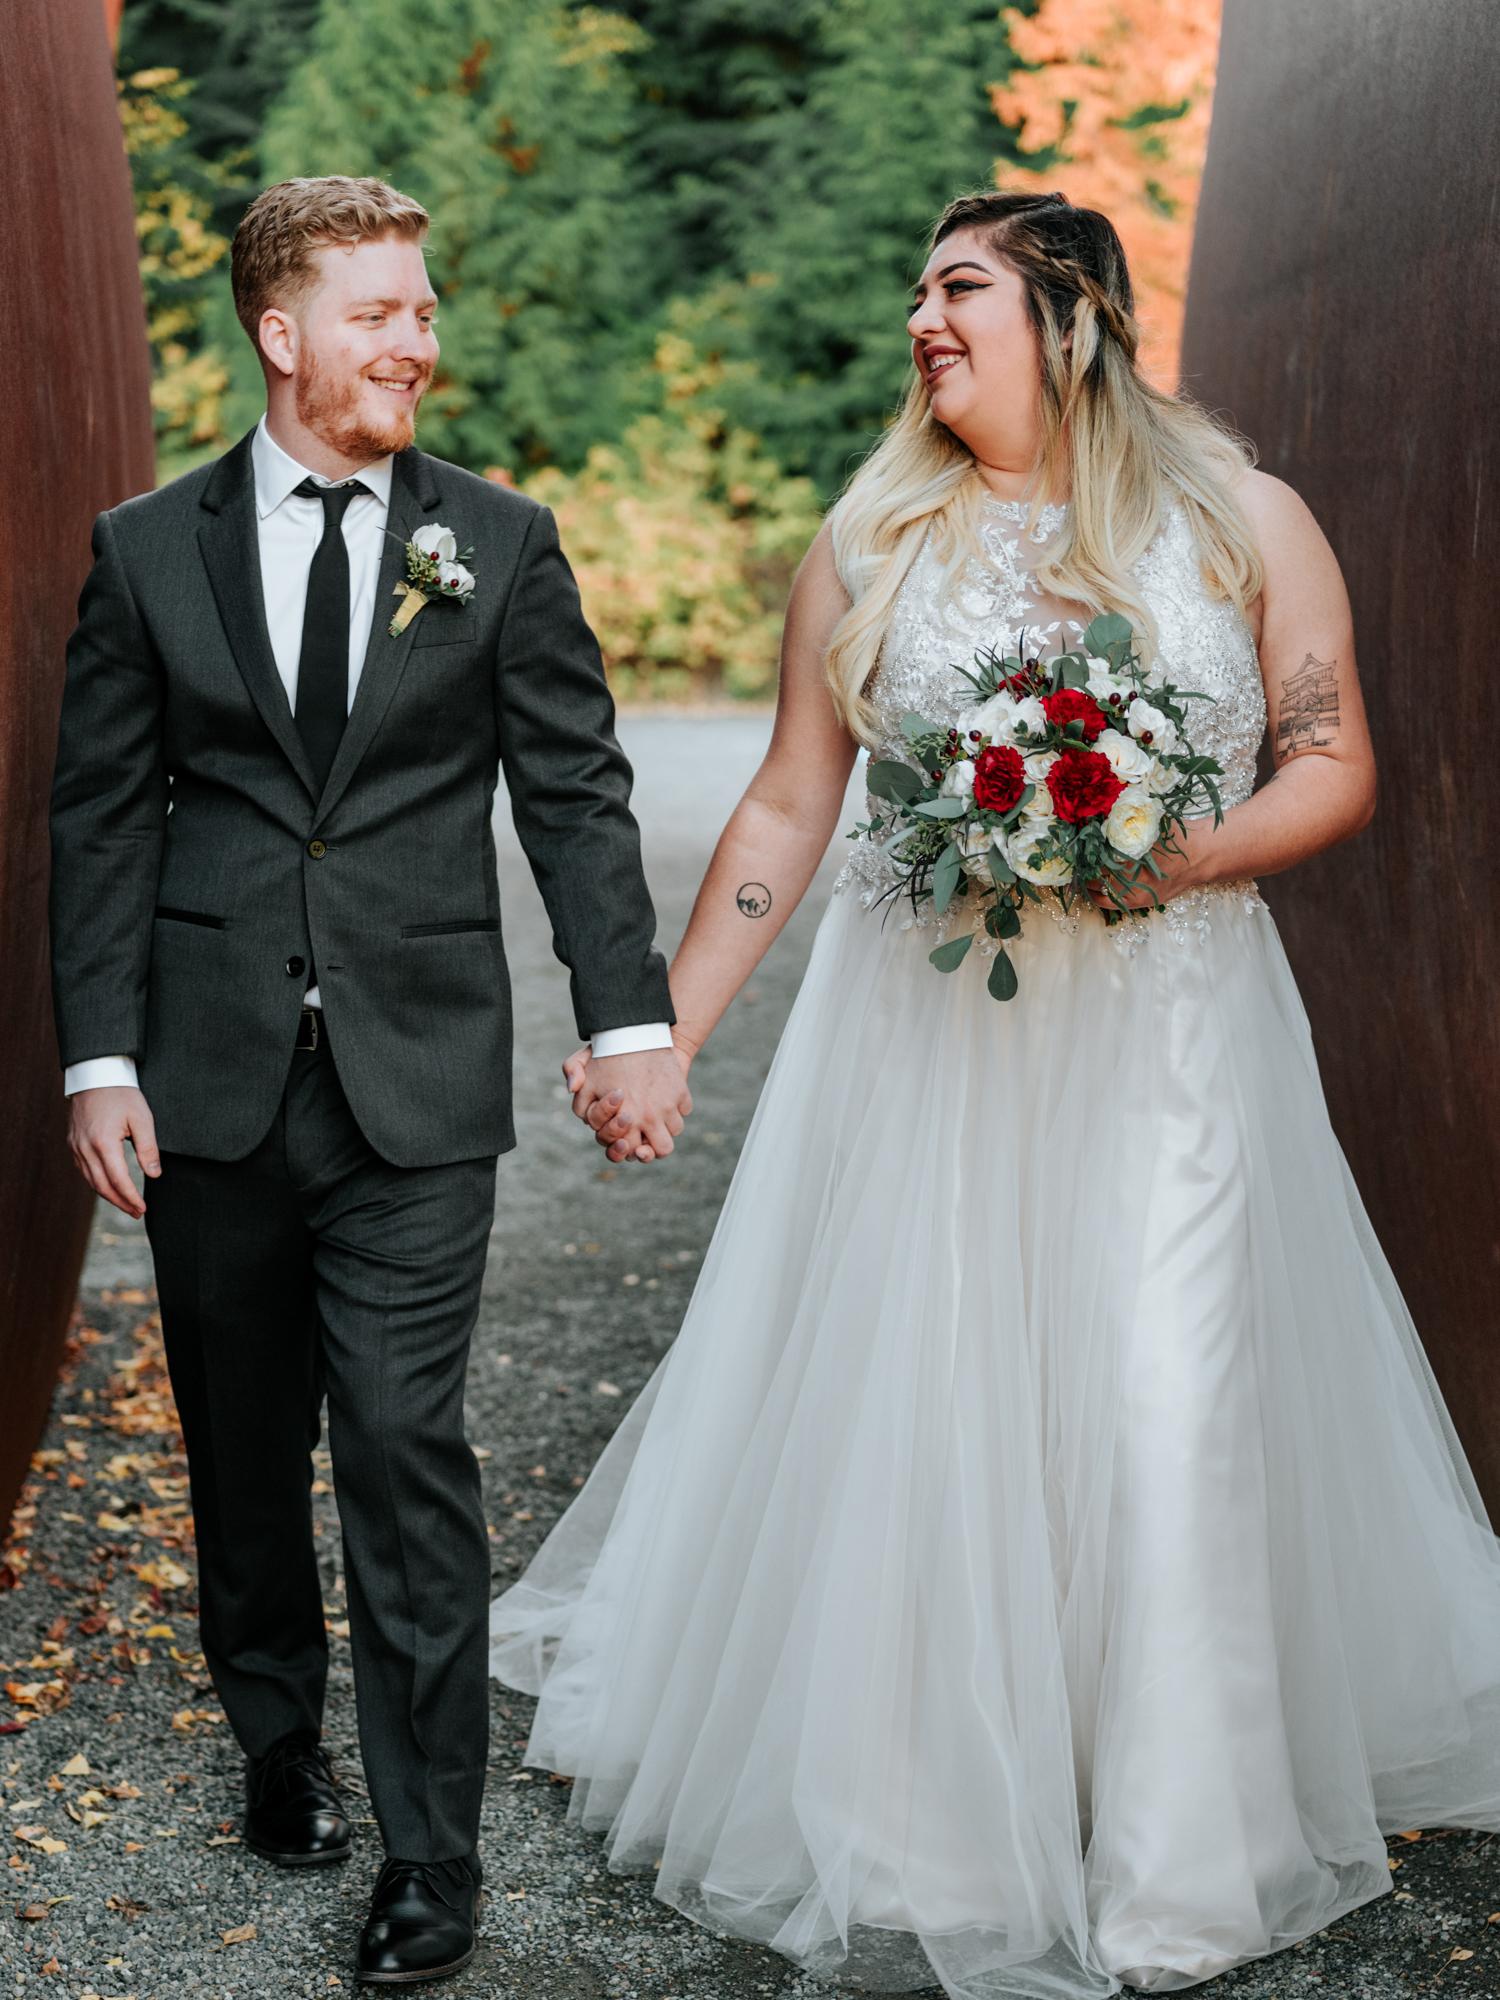 Stolen Glimpses Seattle Wedding Photographers 29.jpg